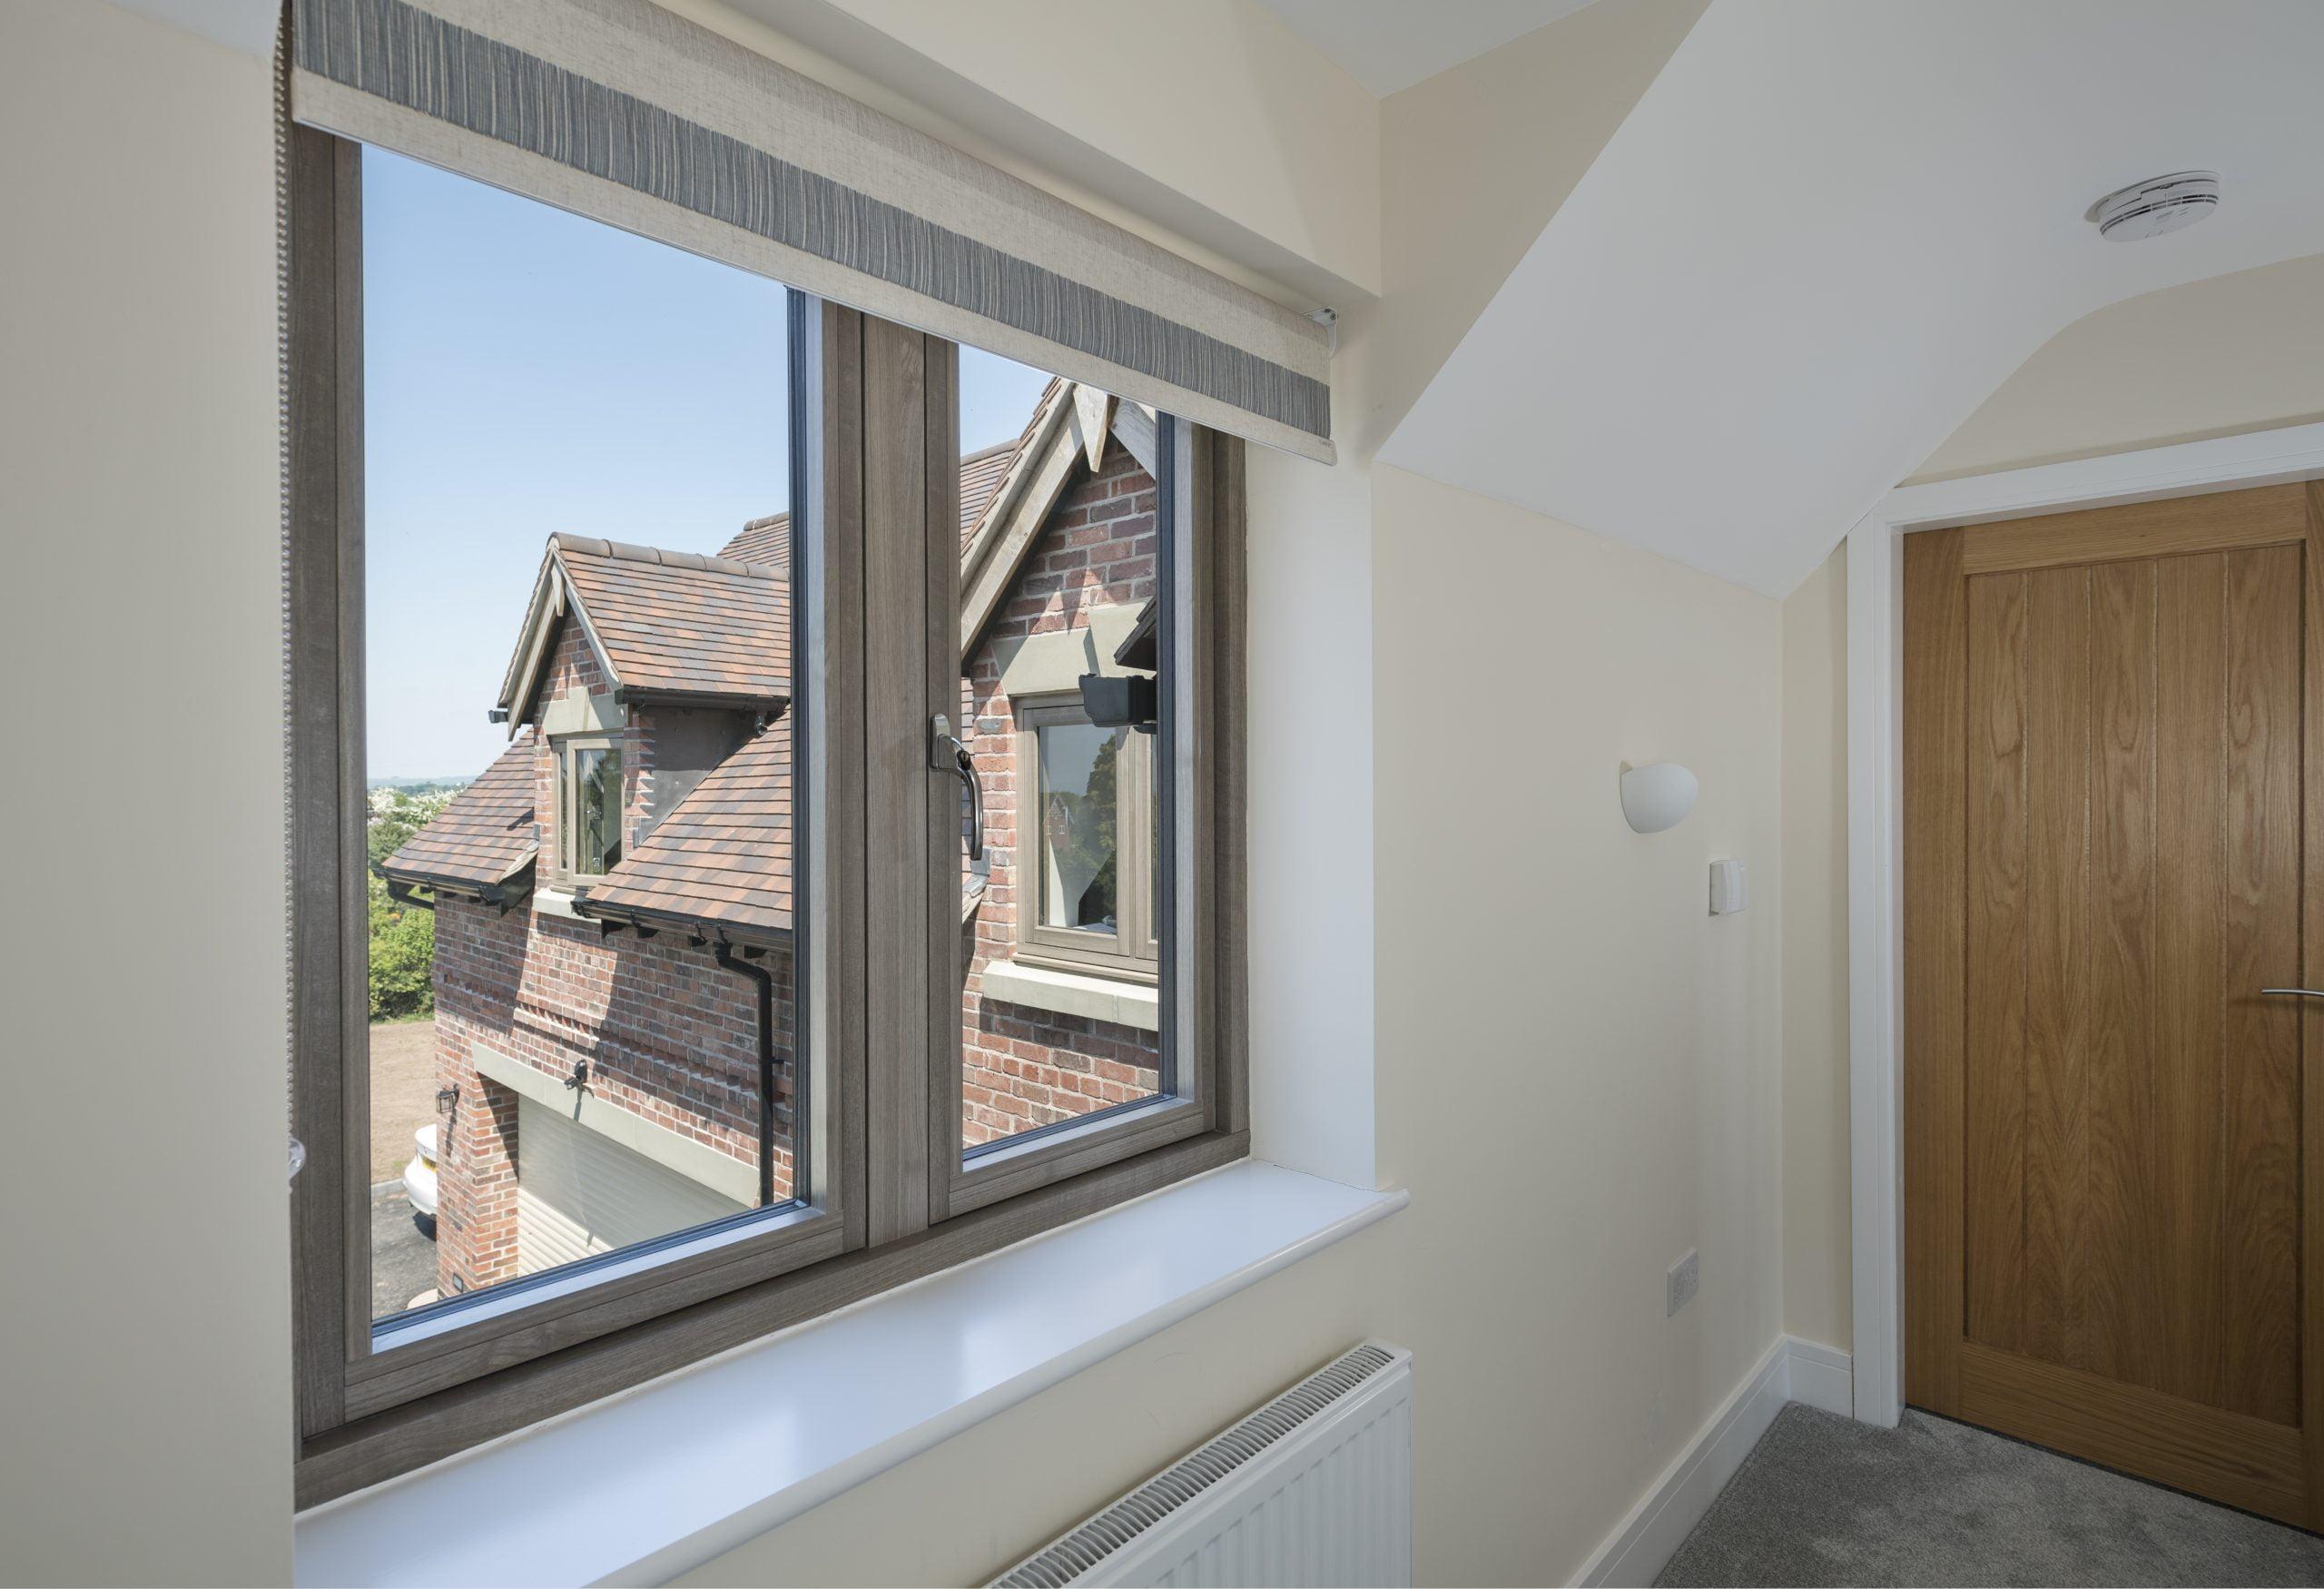 Residence 2 in Silvered Oak by Wharfedale Windows